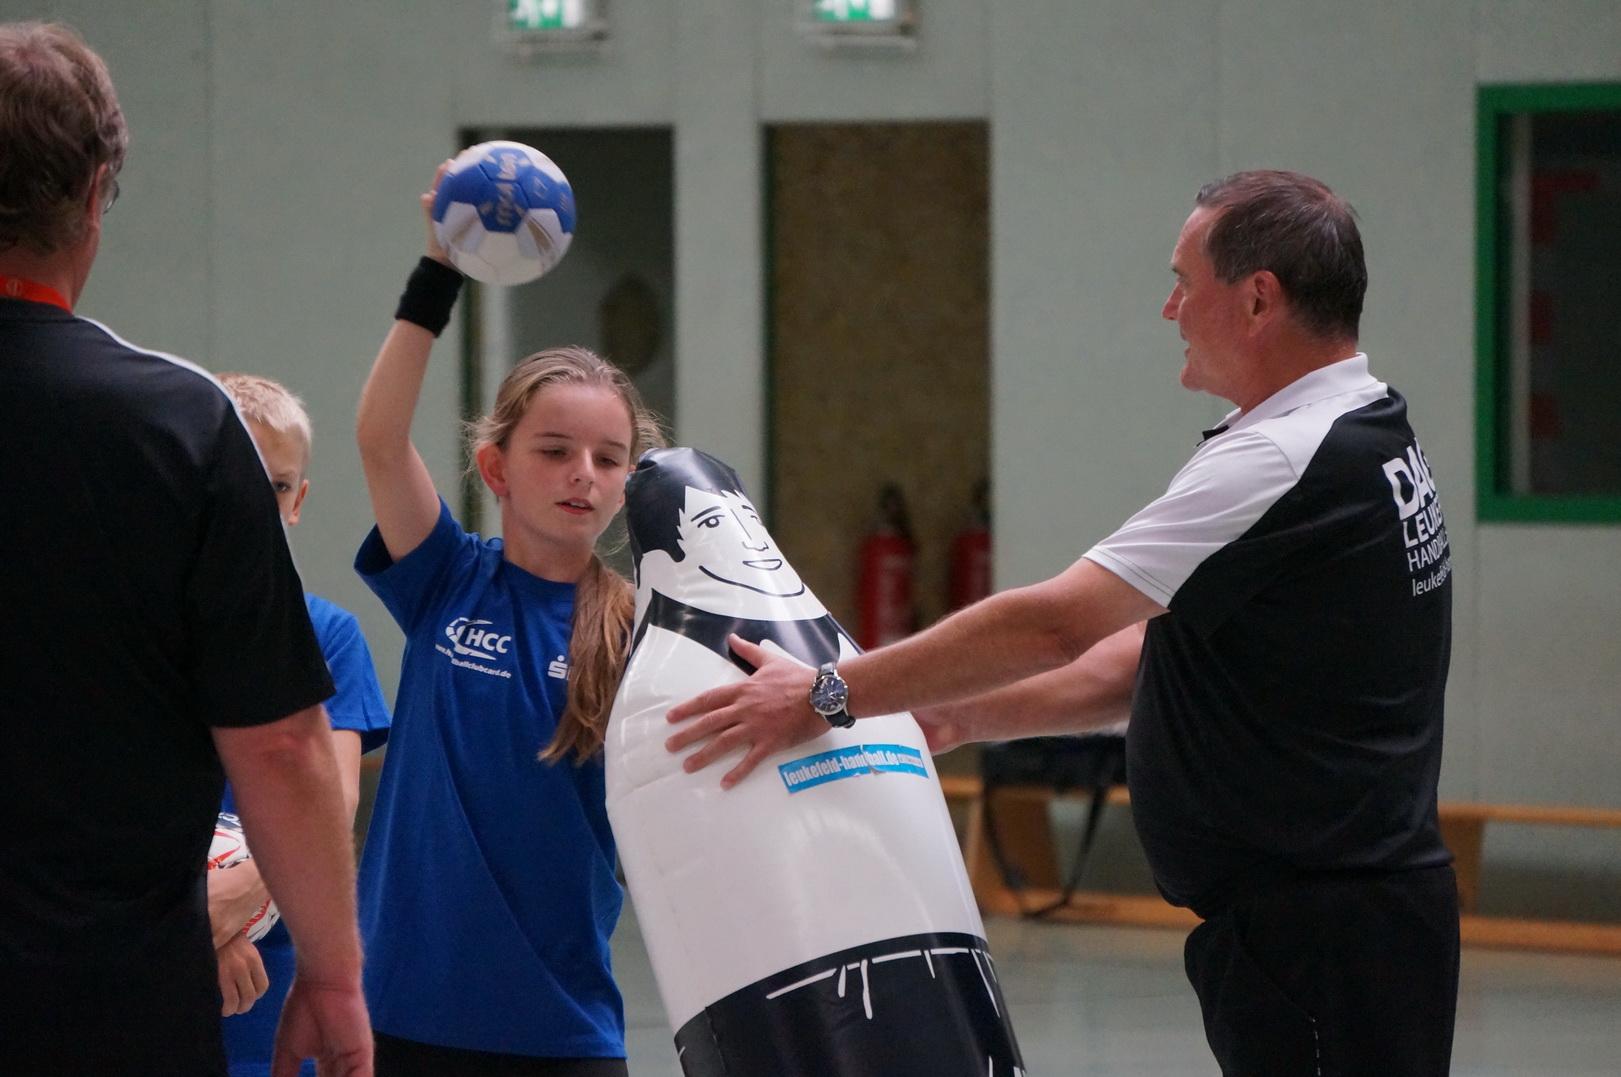 201808_Handballcamp_SDH_MG_210w